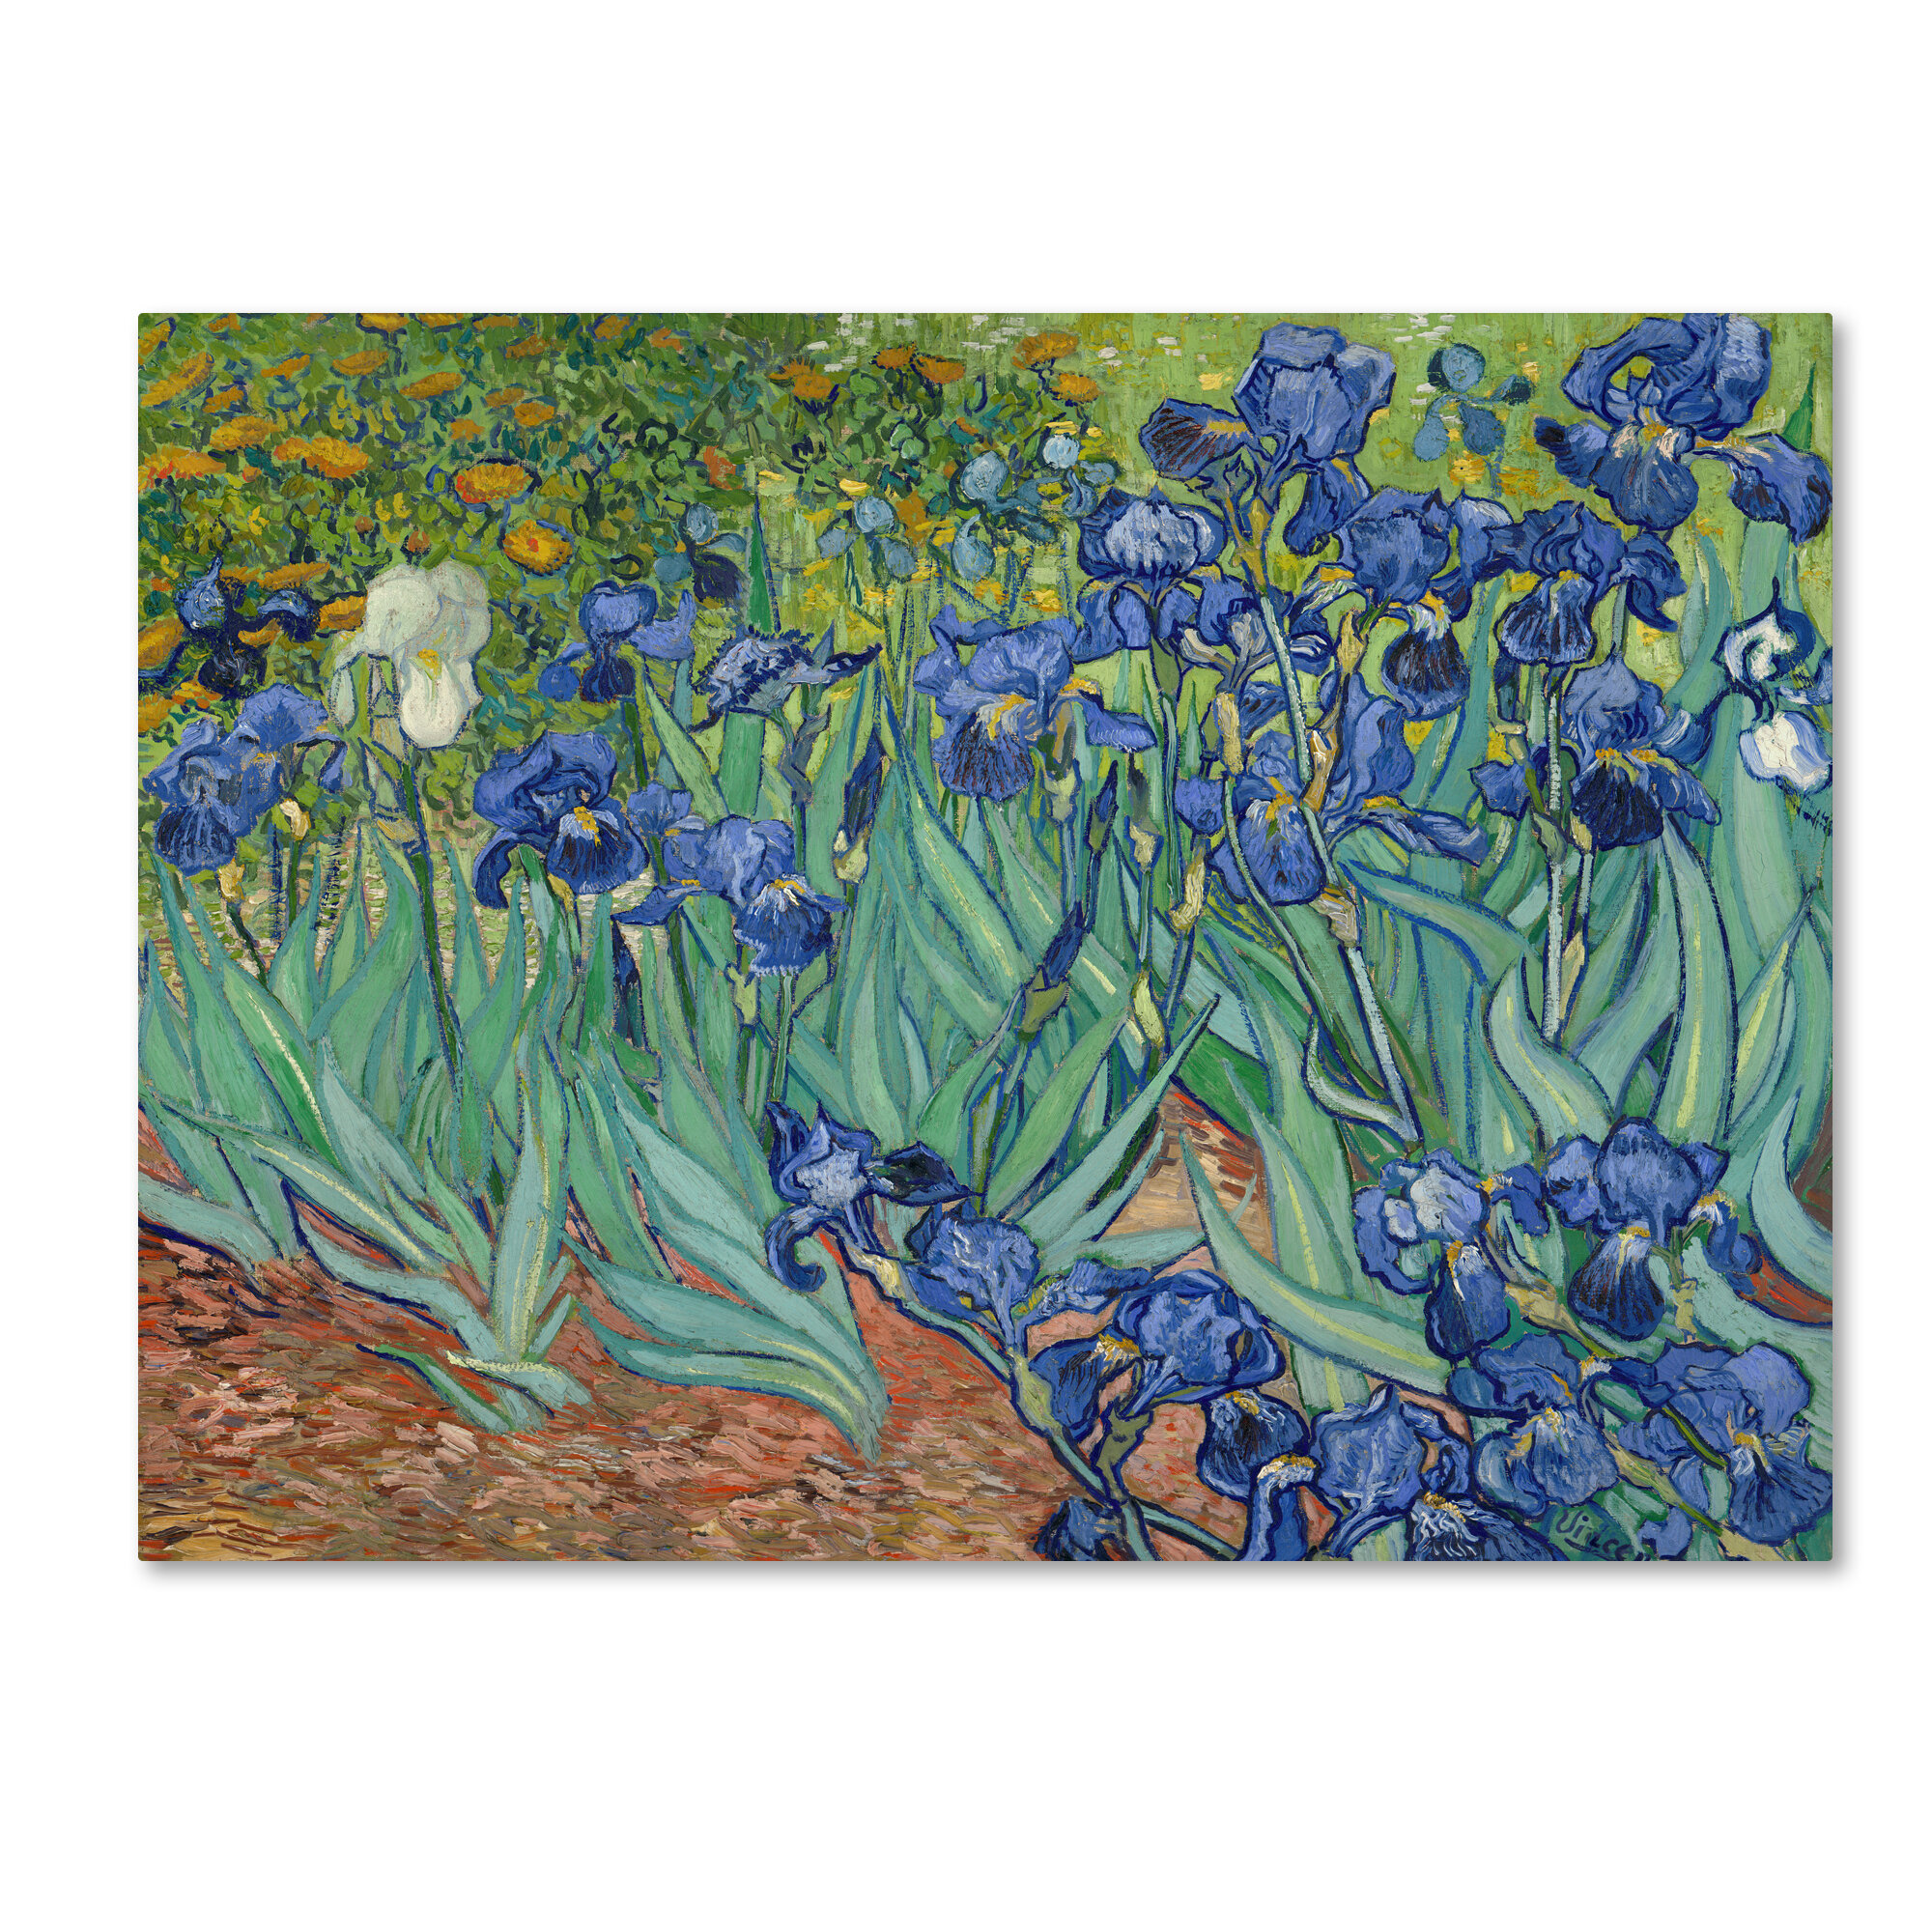 Van Gogh-Irises-Wedge Frame Picture On Canvas